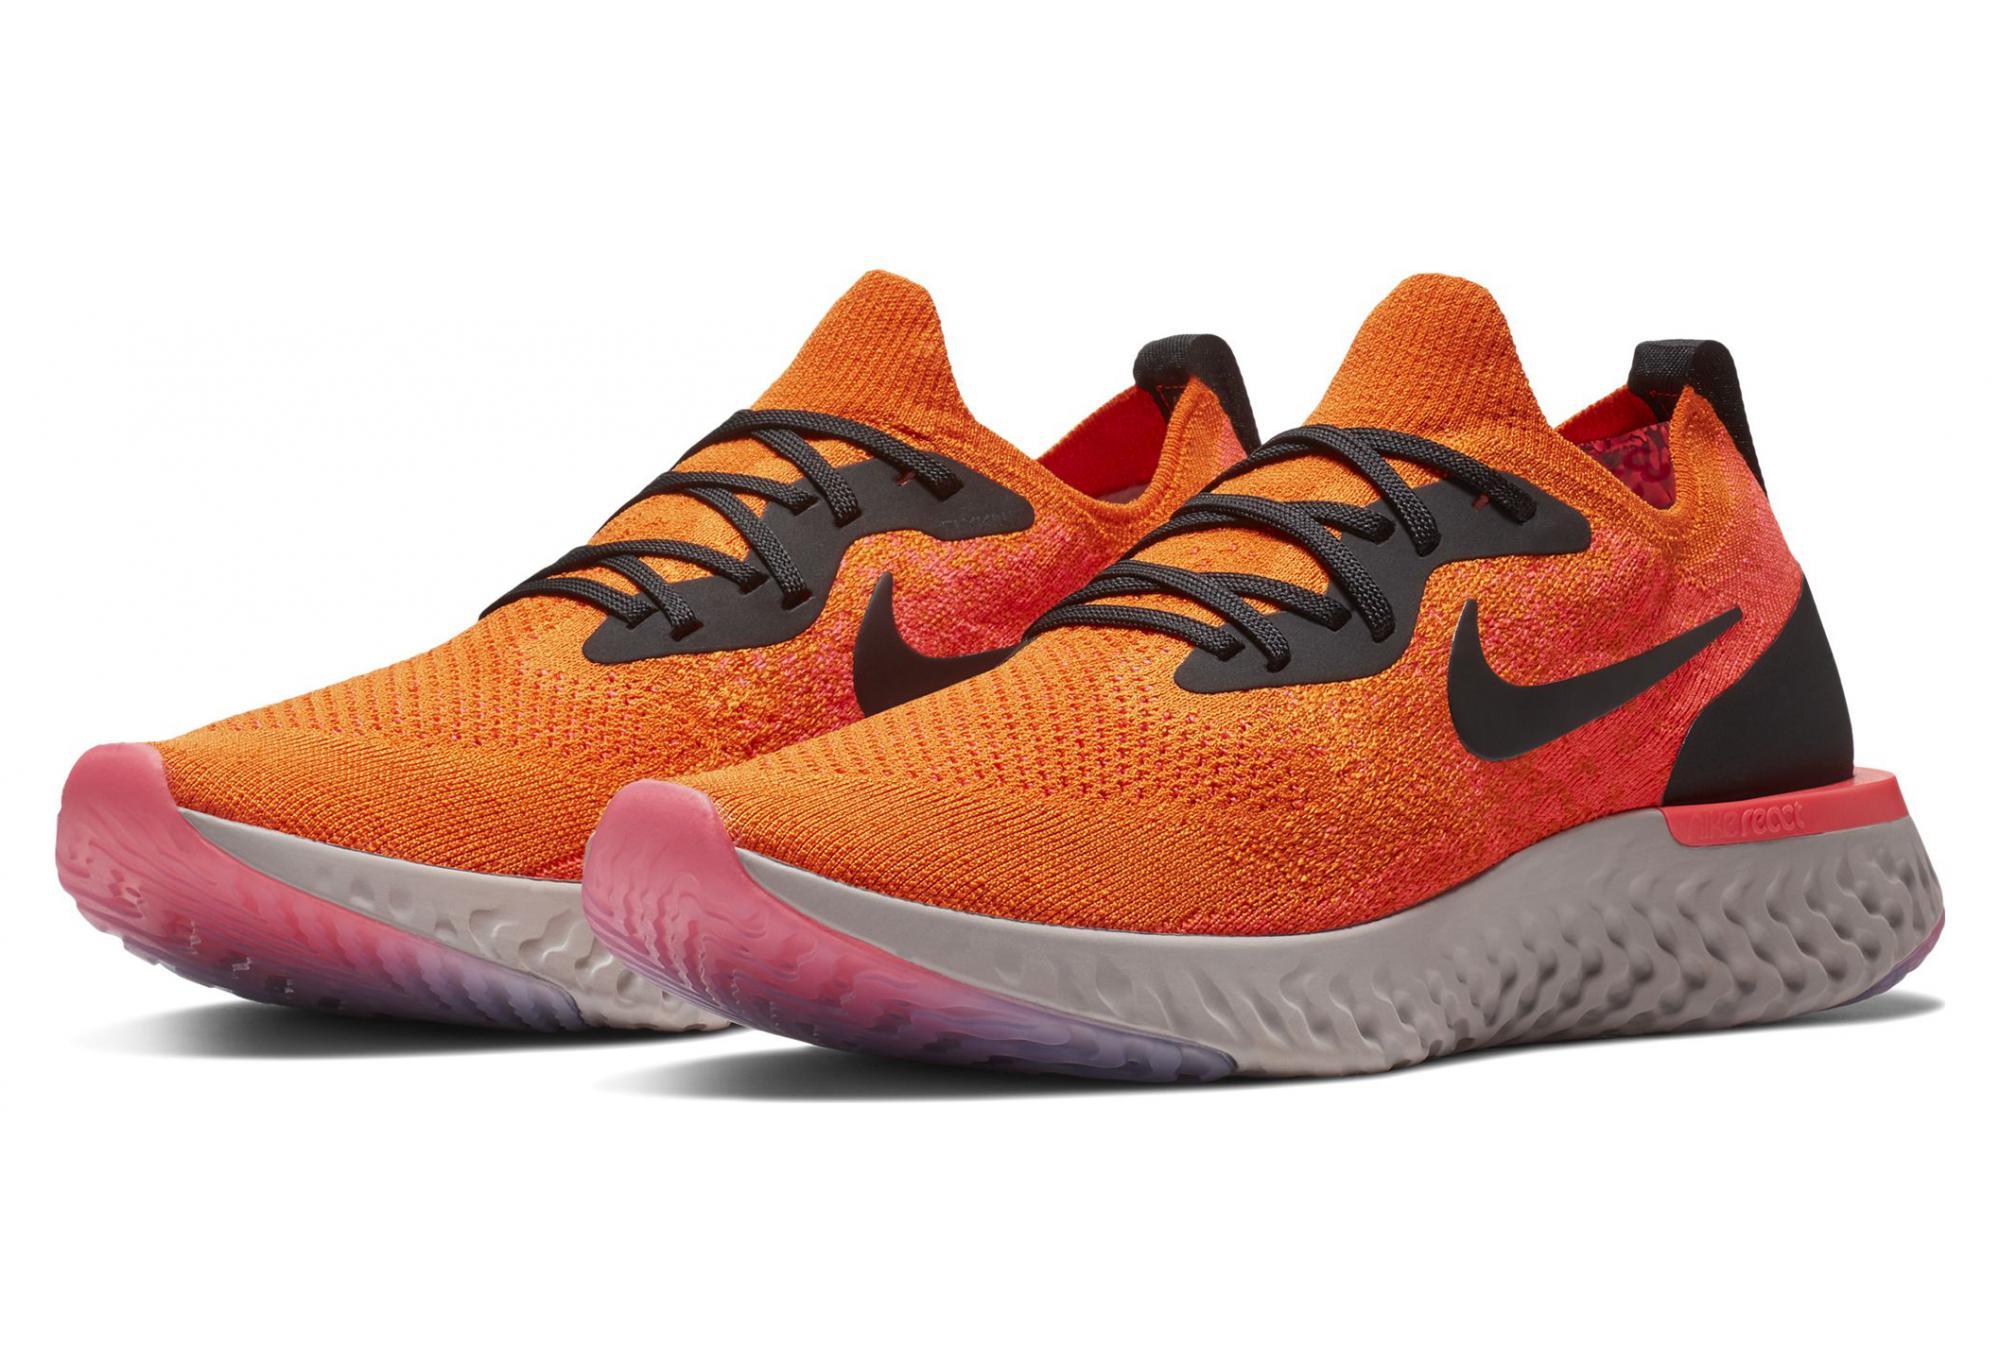 cee5d5dd5e0 Zapatillas Nike Epic React Flyknit para Hombre Naranja   Rosa